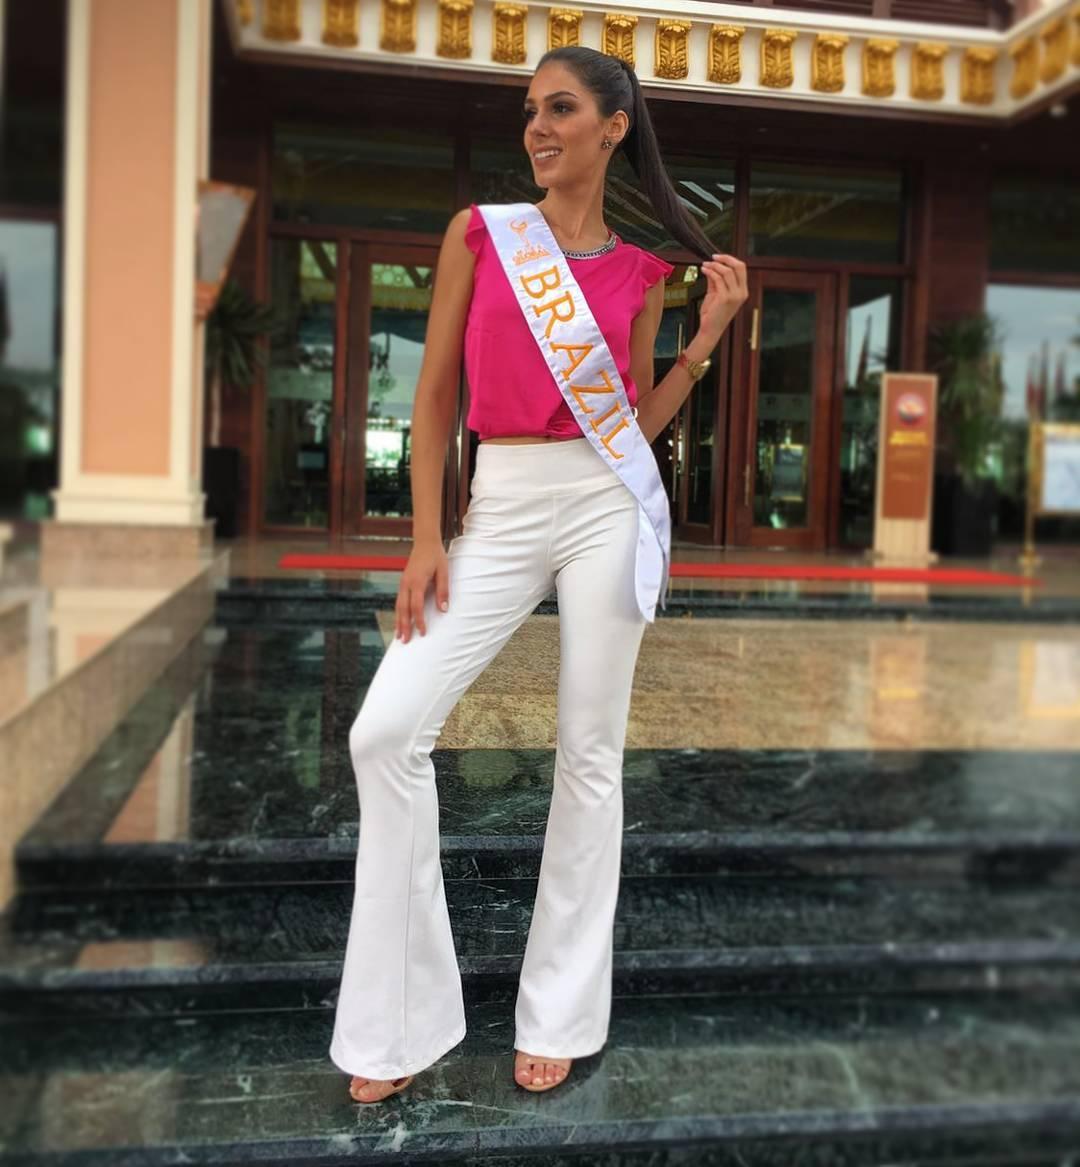 brasil vence miss global 2017. - Página 2 23507418